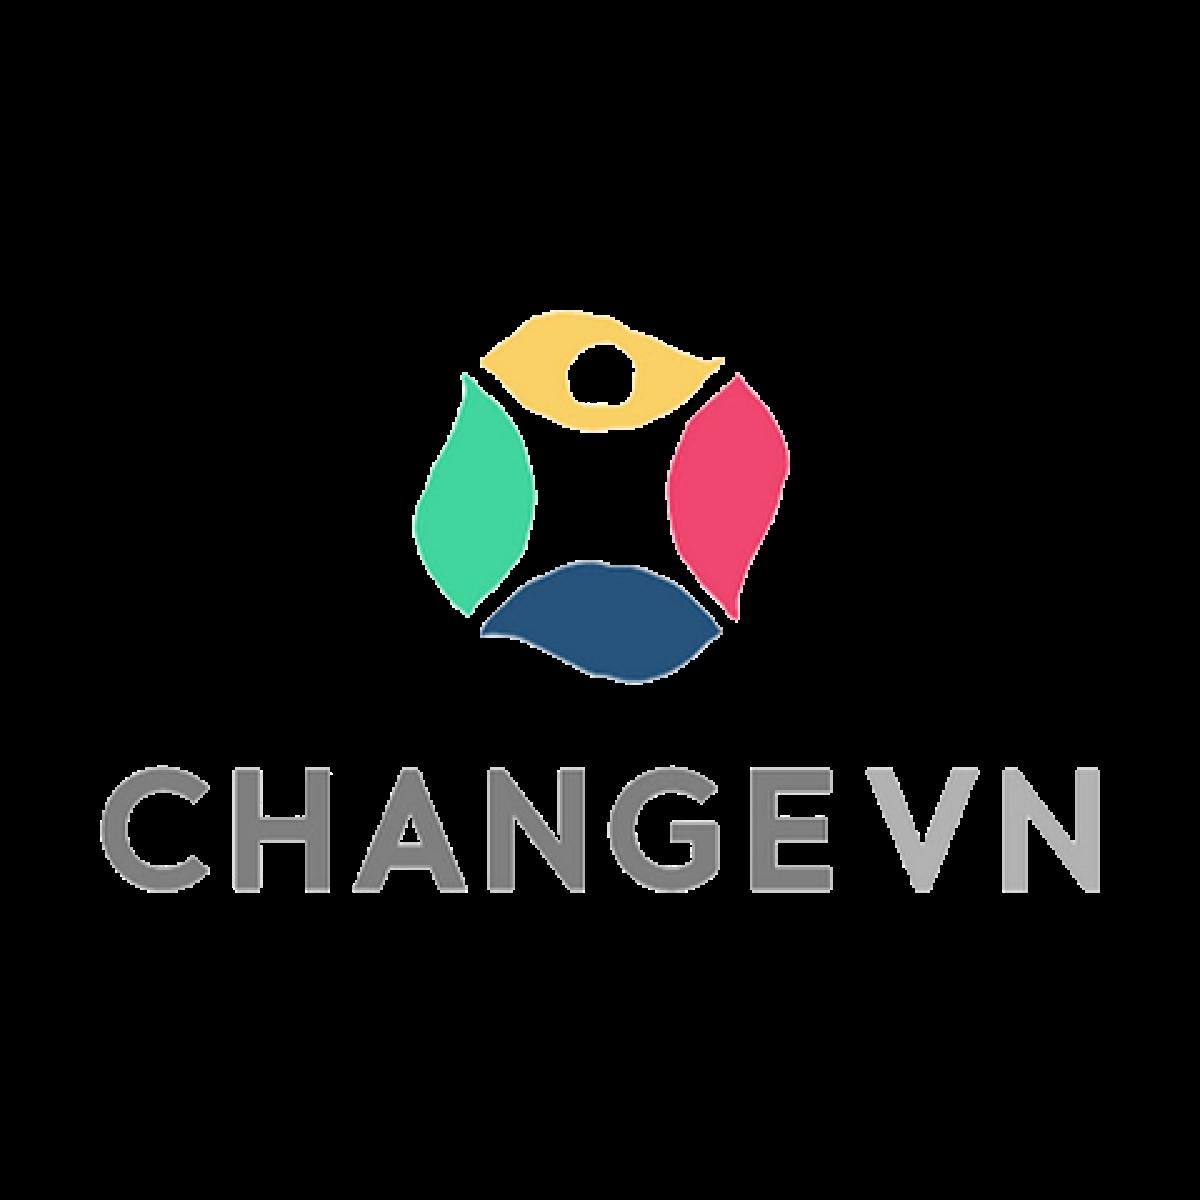 Changevn